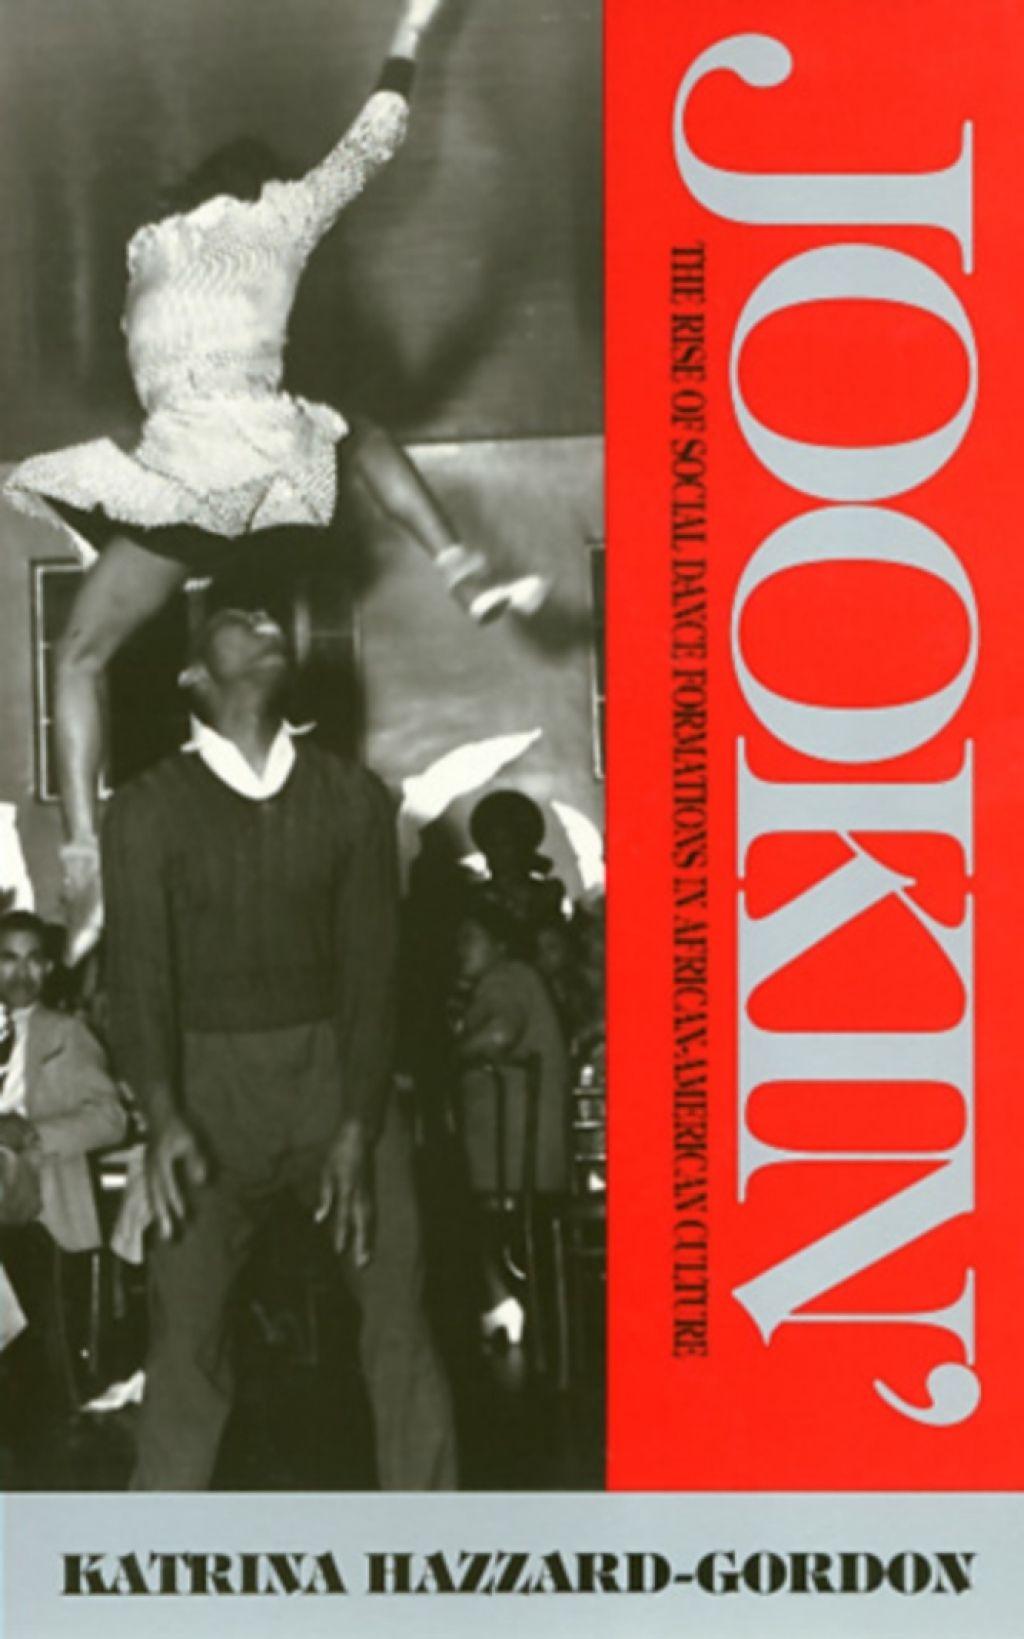 Jookin' (eBook) Dance books, African american culture